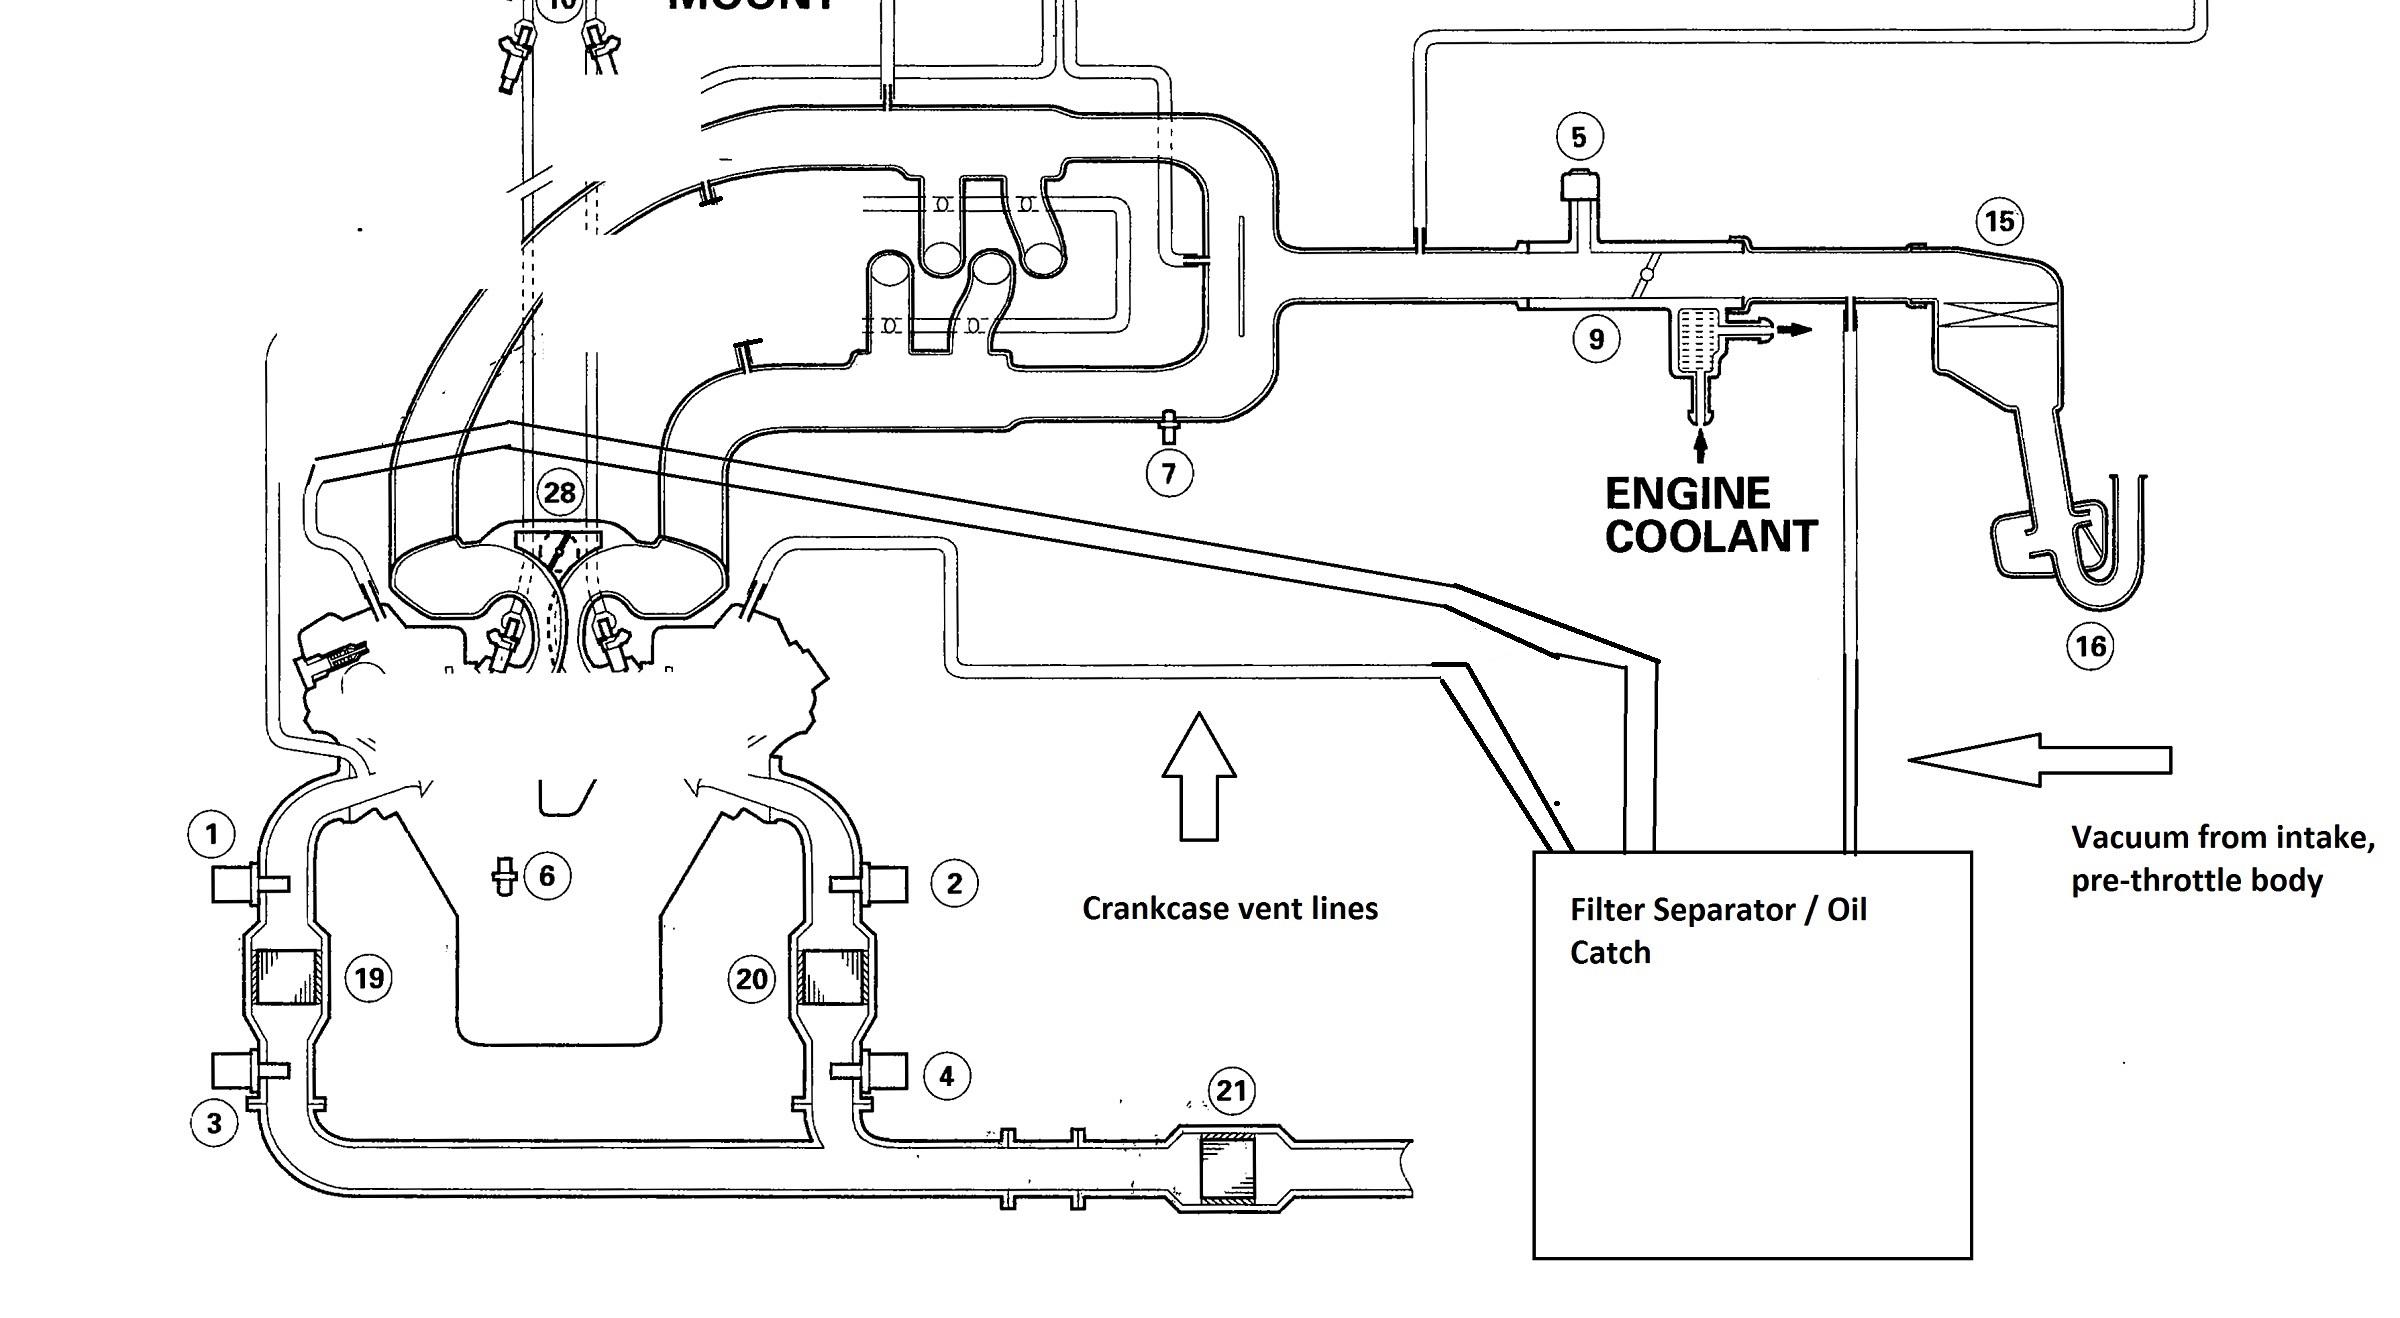 acura tl engine coolant